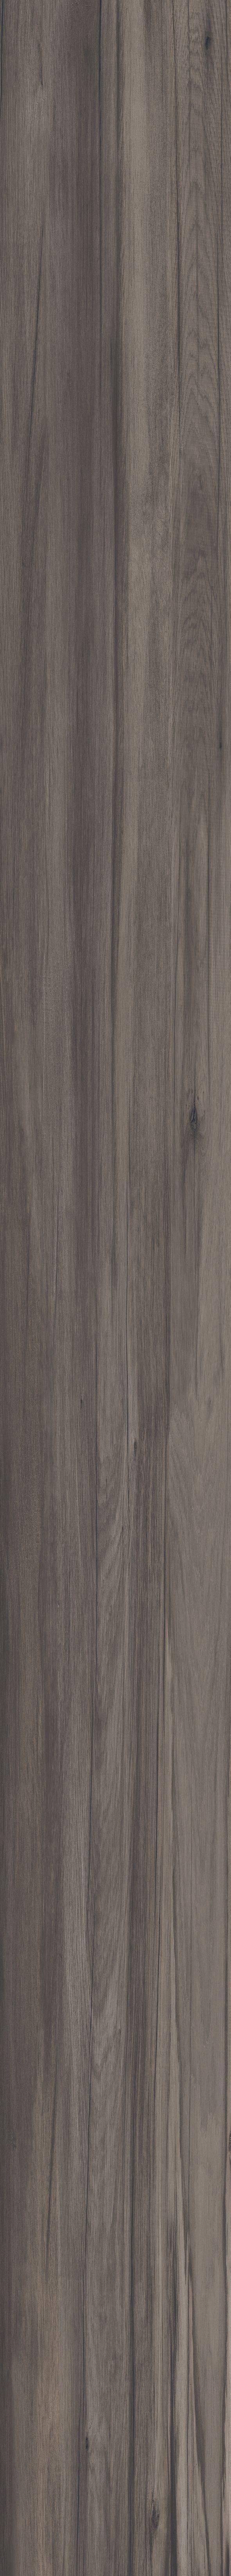 24 best dolphin images on pinterest ceramic tile floors doga ceramica 40x170cm dolphin coal di abkemozioni ceramic tiles floor dailygadgetfo Images